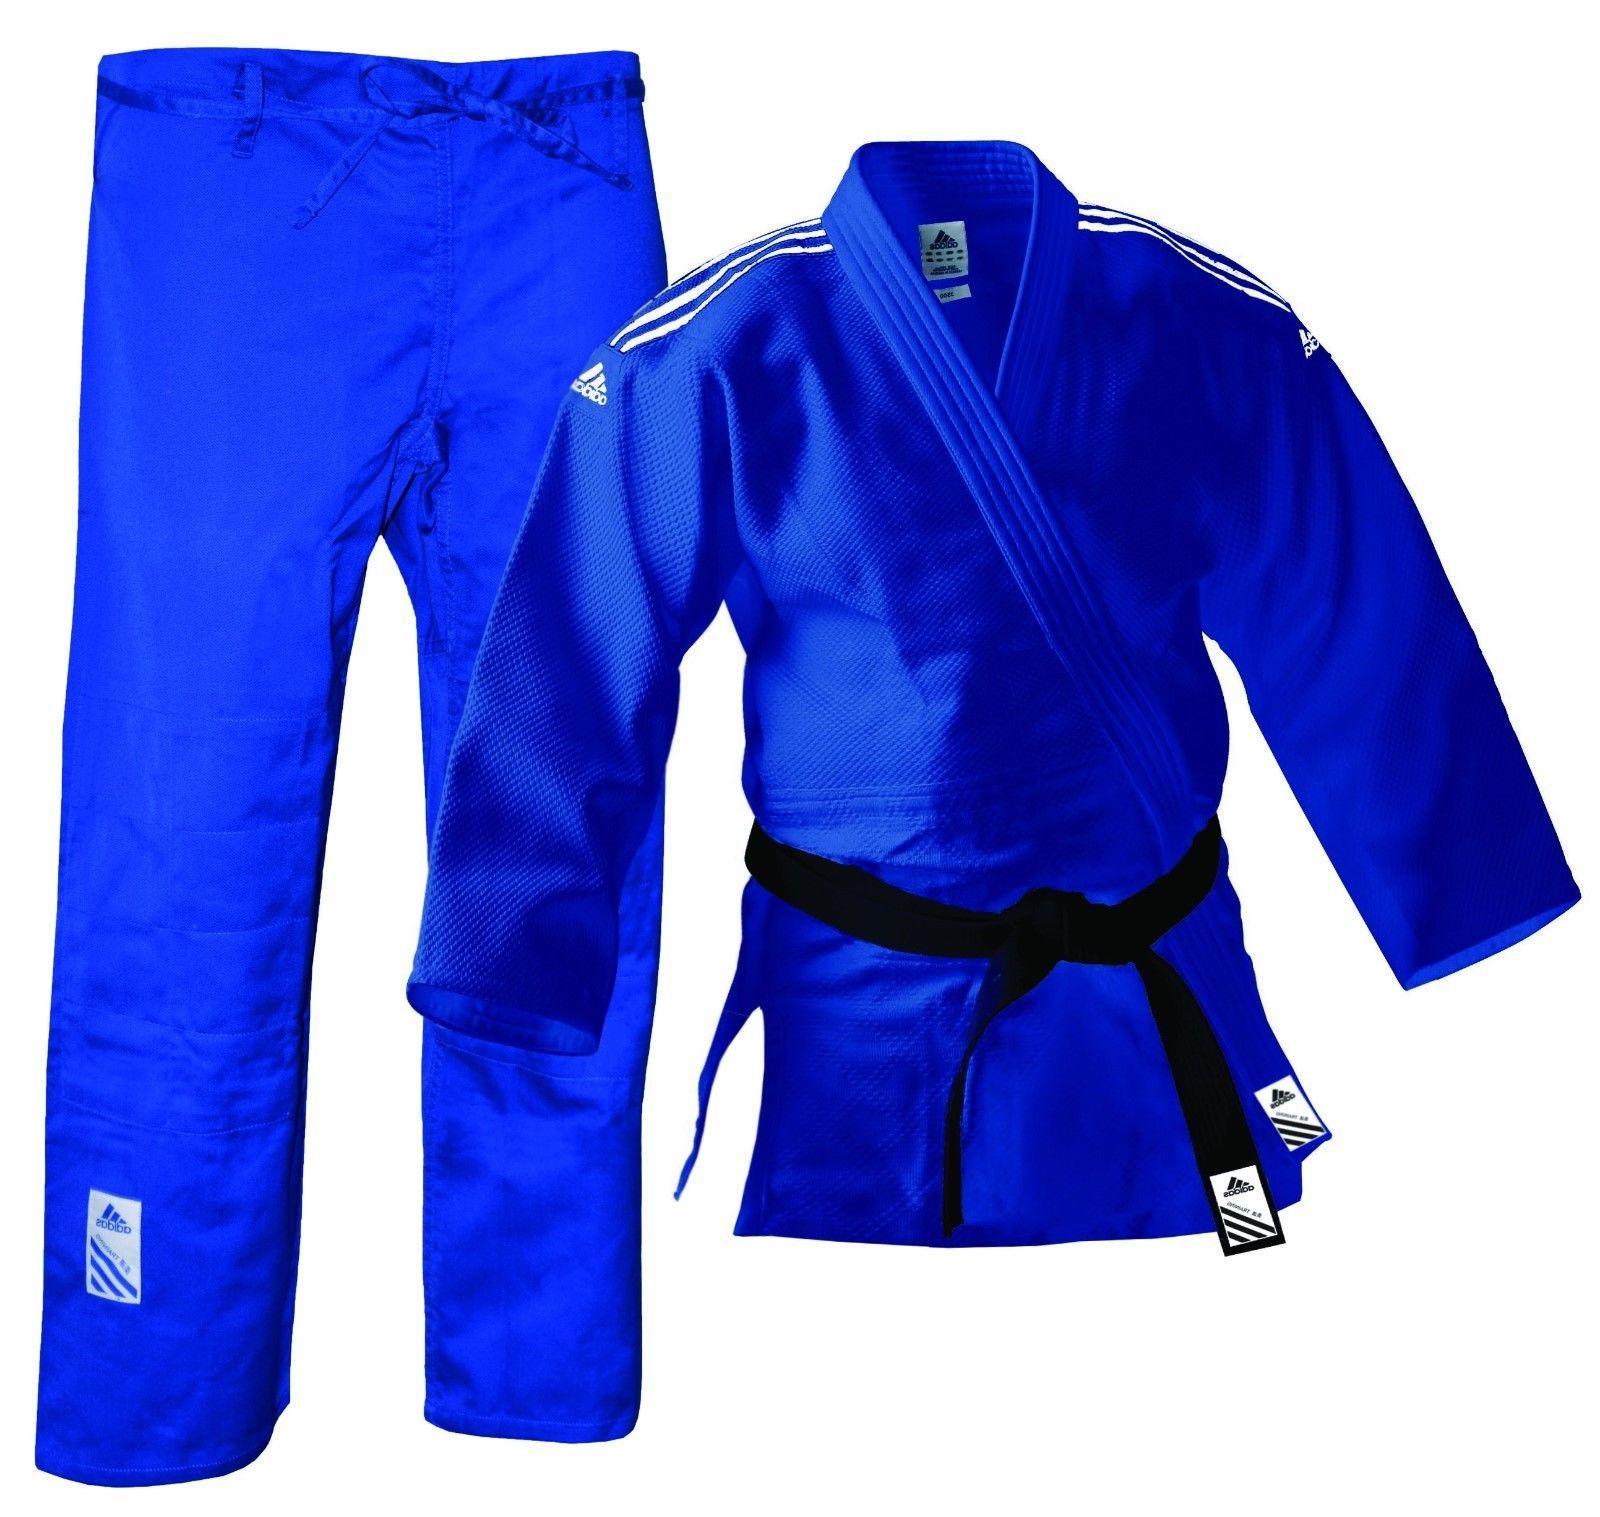 judo uniforms training j500 blue size 160